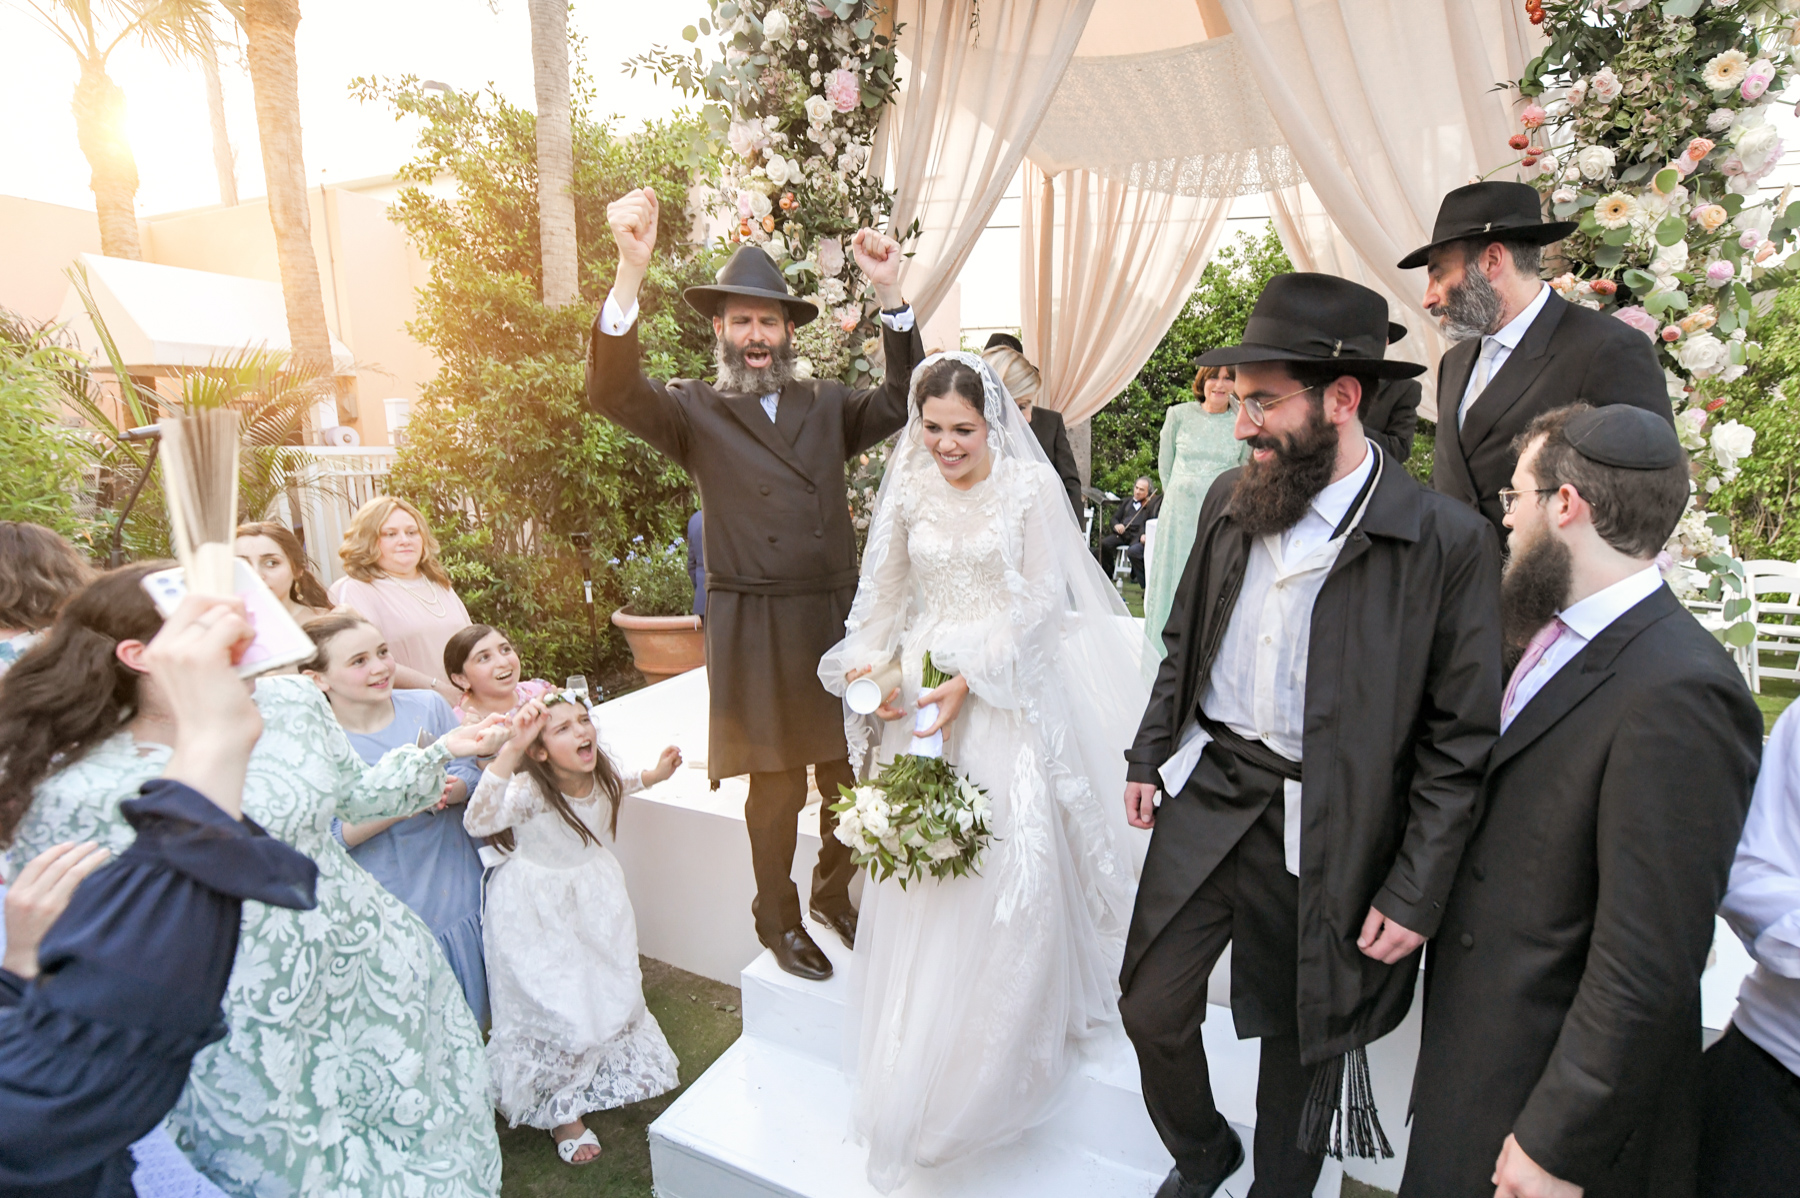 JEWISH ORTHODOX WEDDING IN PALM BEACH BY DOMINO ARTS PHOTOGRAPHY